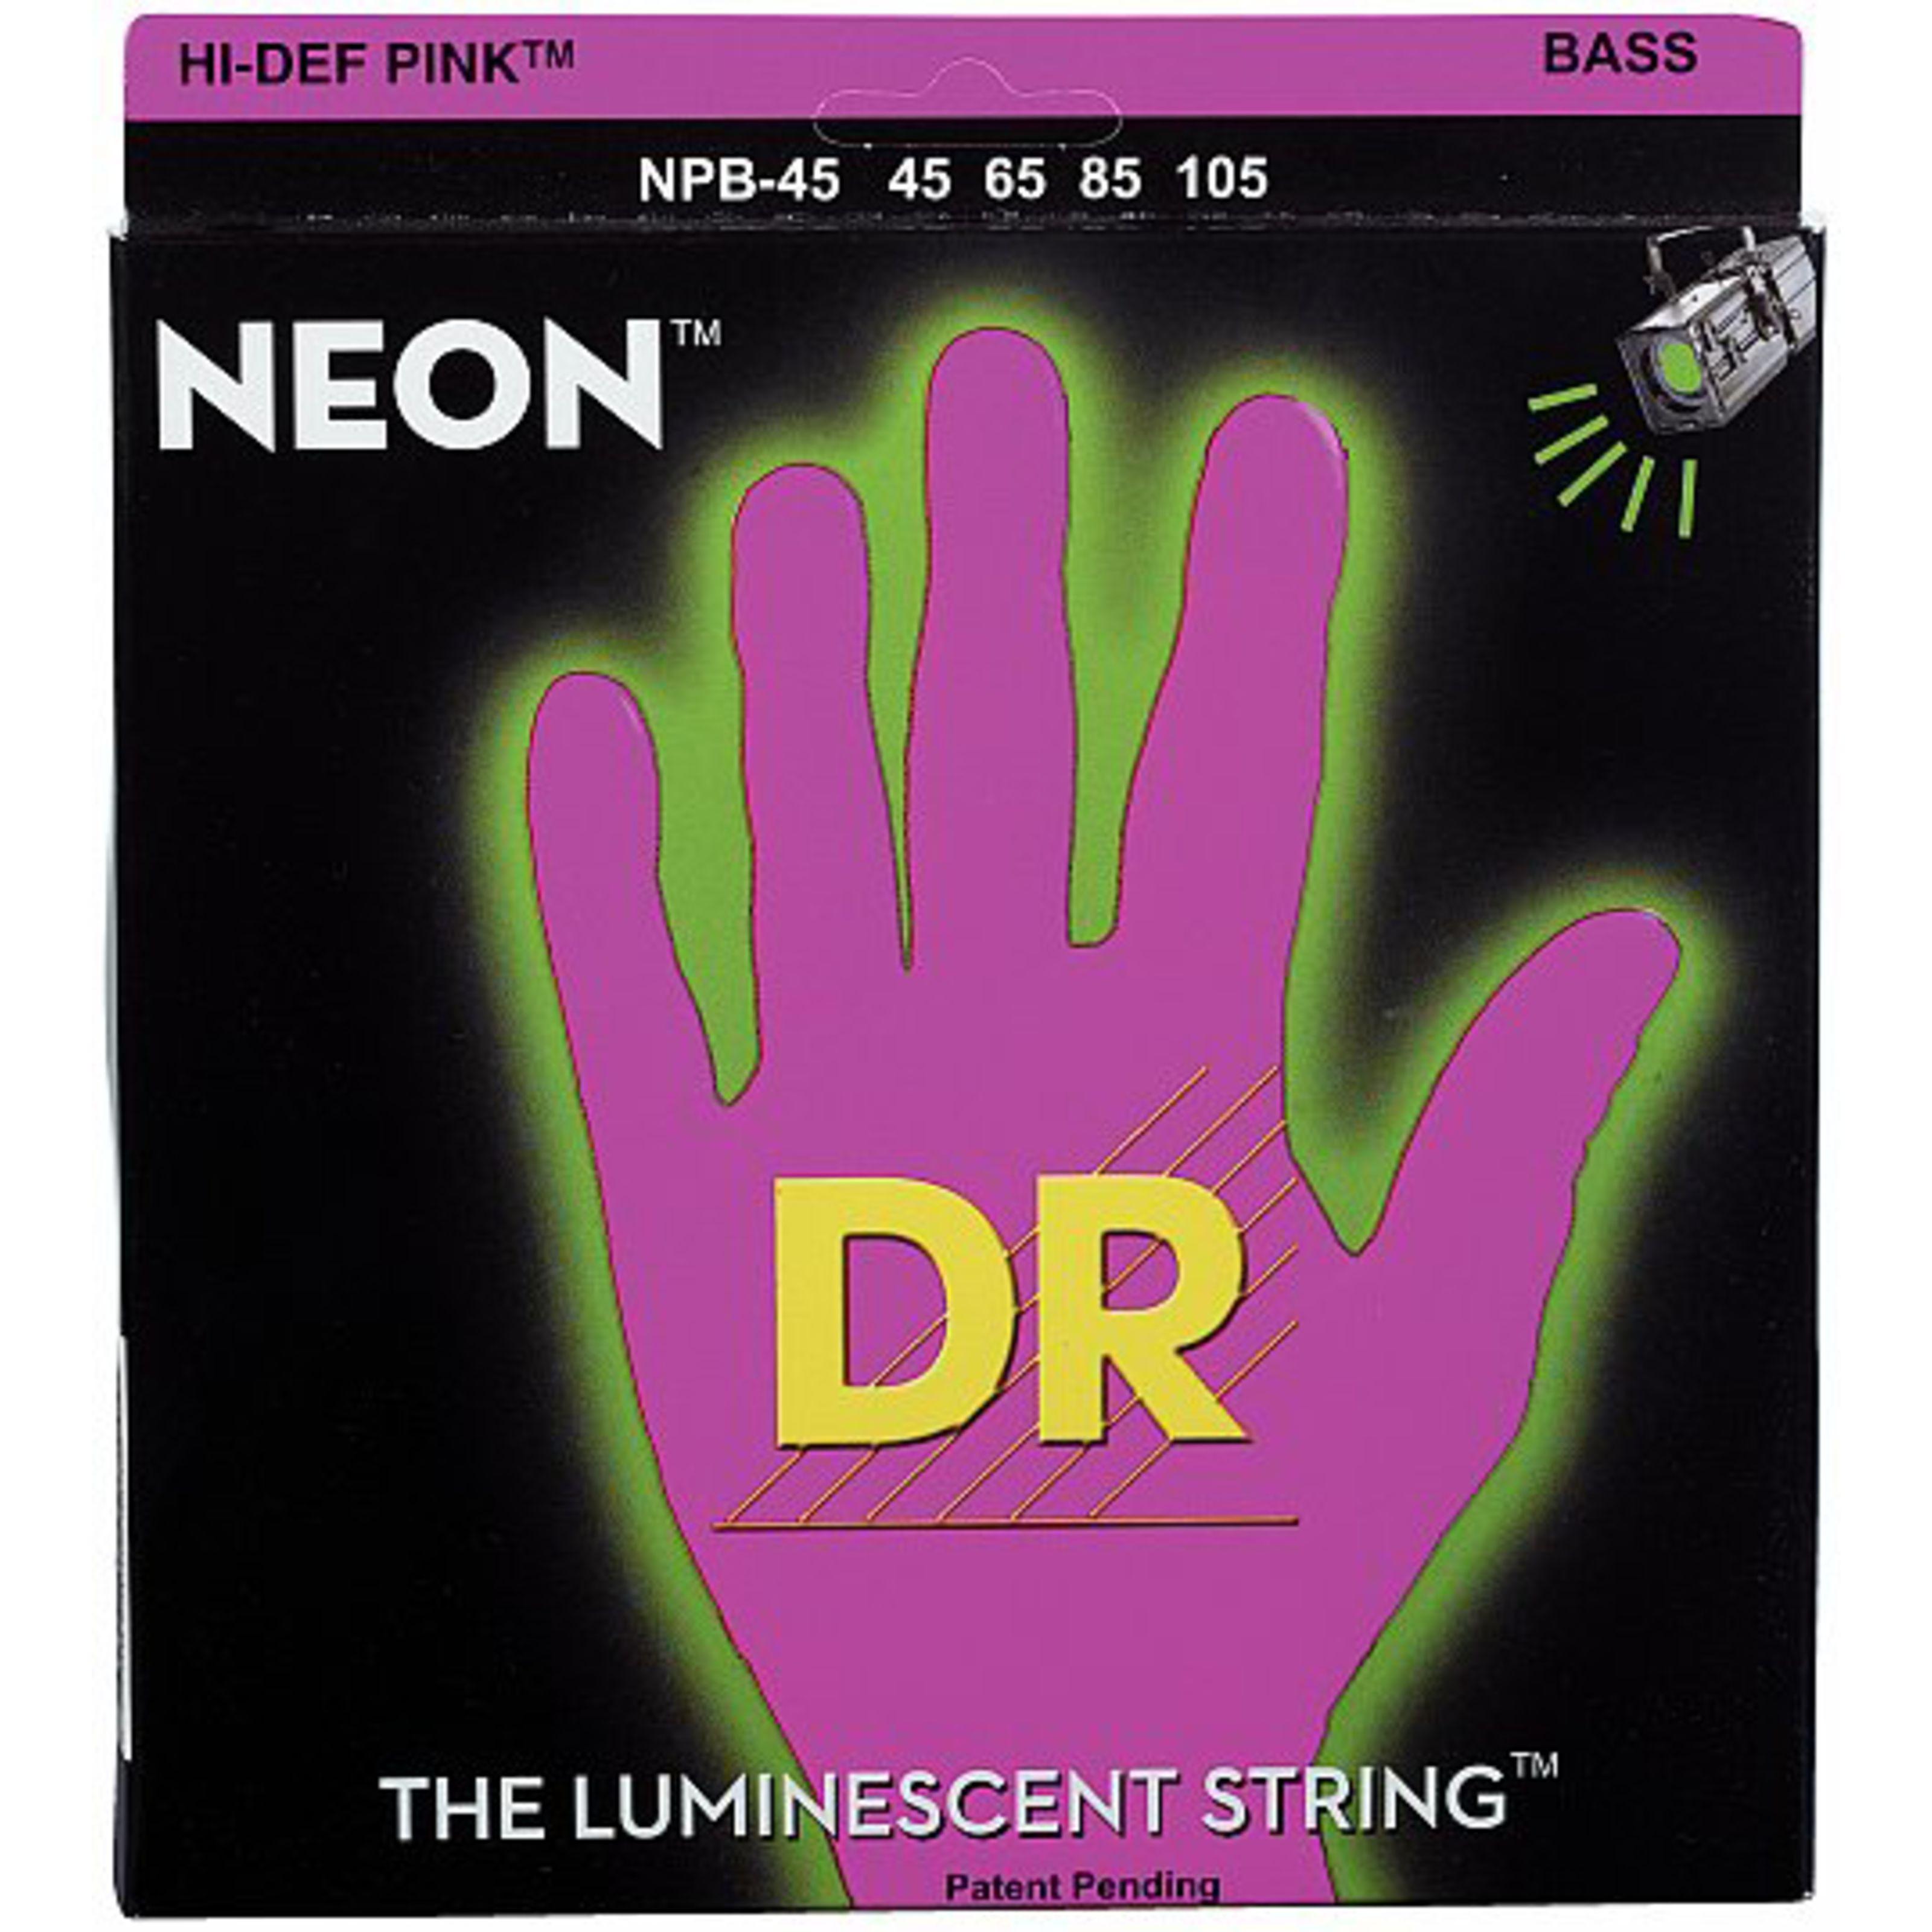 DR - 4er Bass 45-105 Hi-Def Neon Pink Neon NPB-45 DR B NEON NPB-45